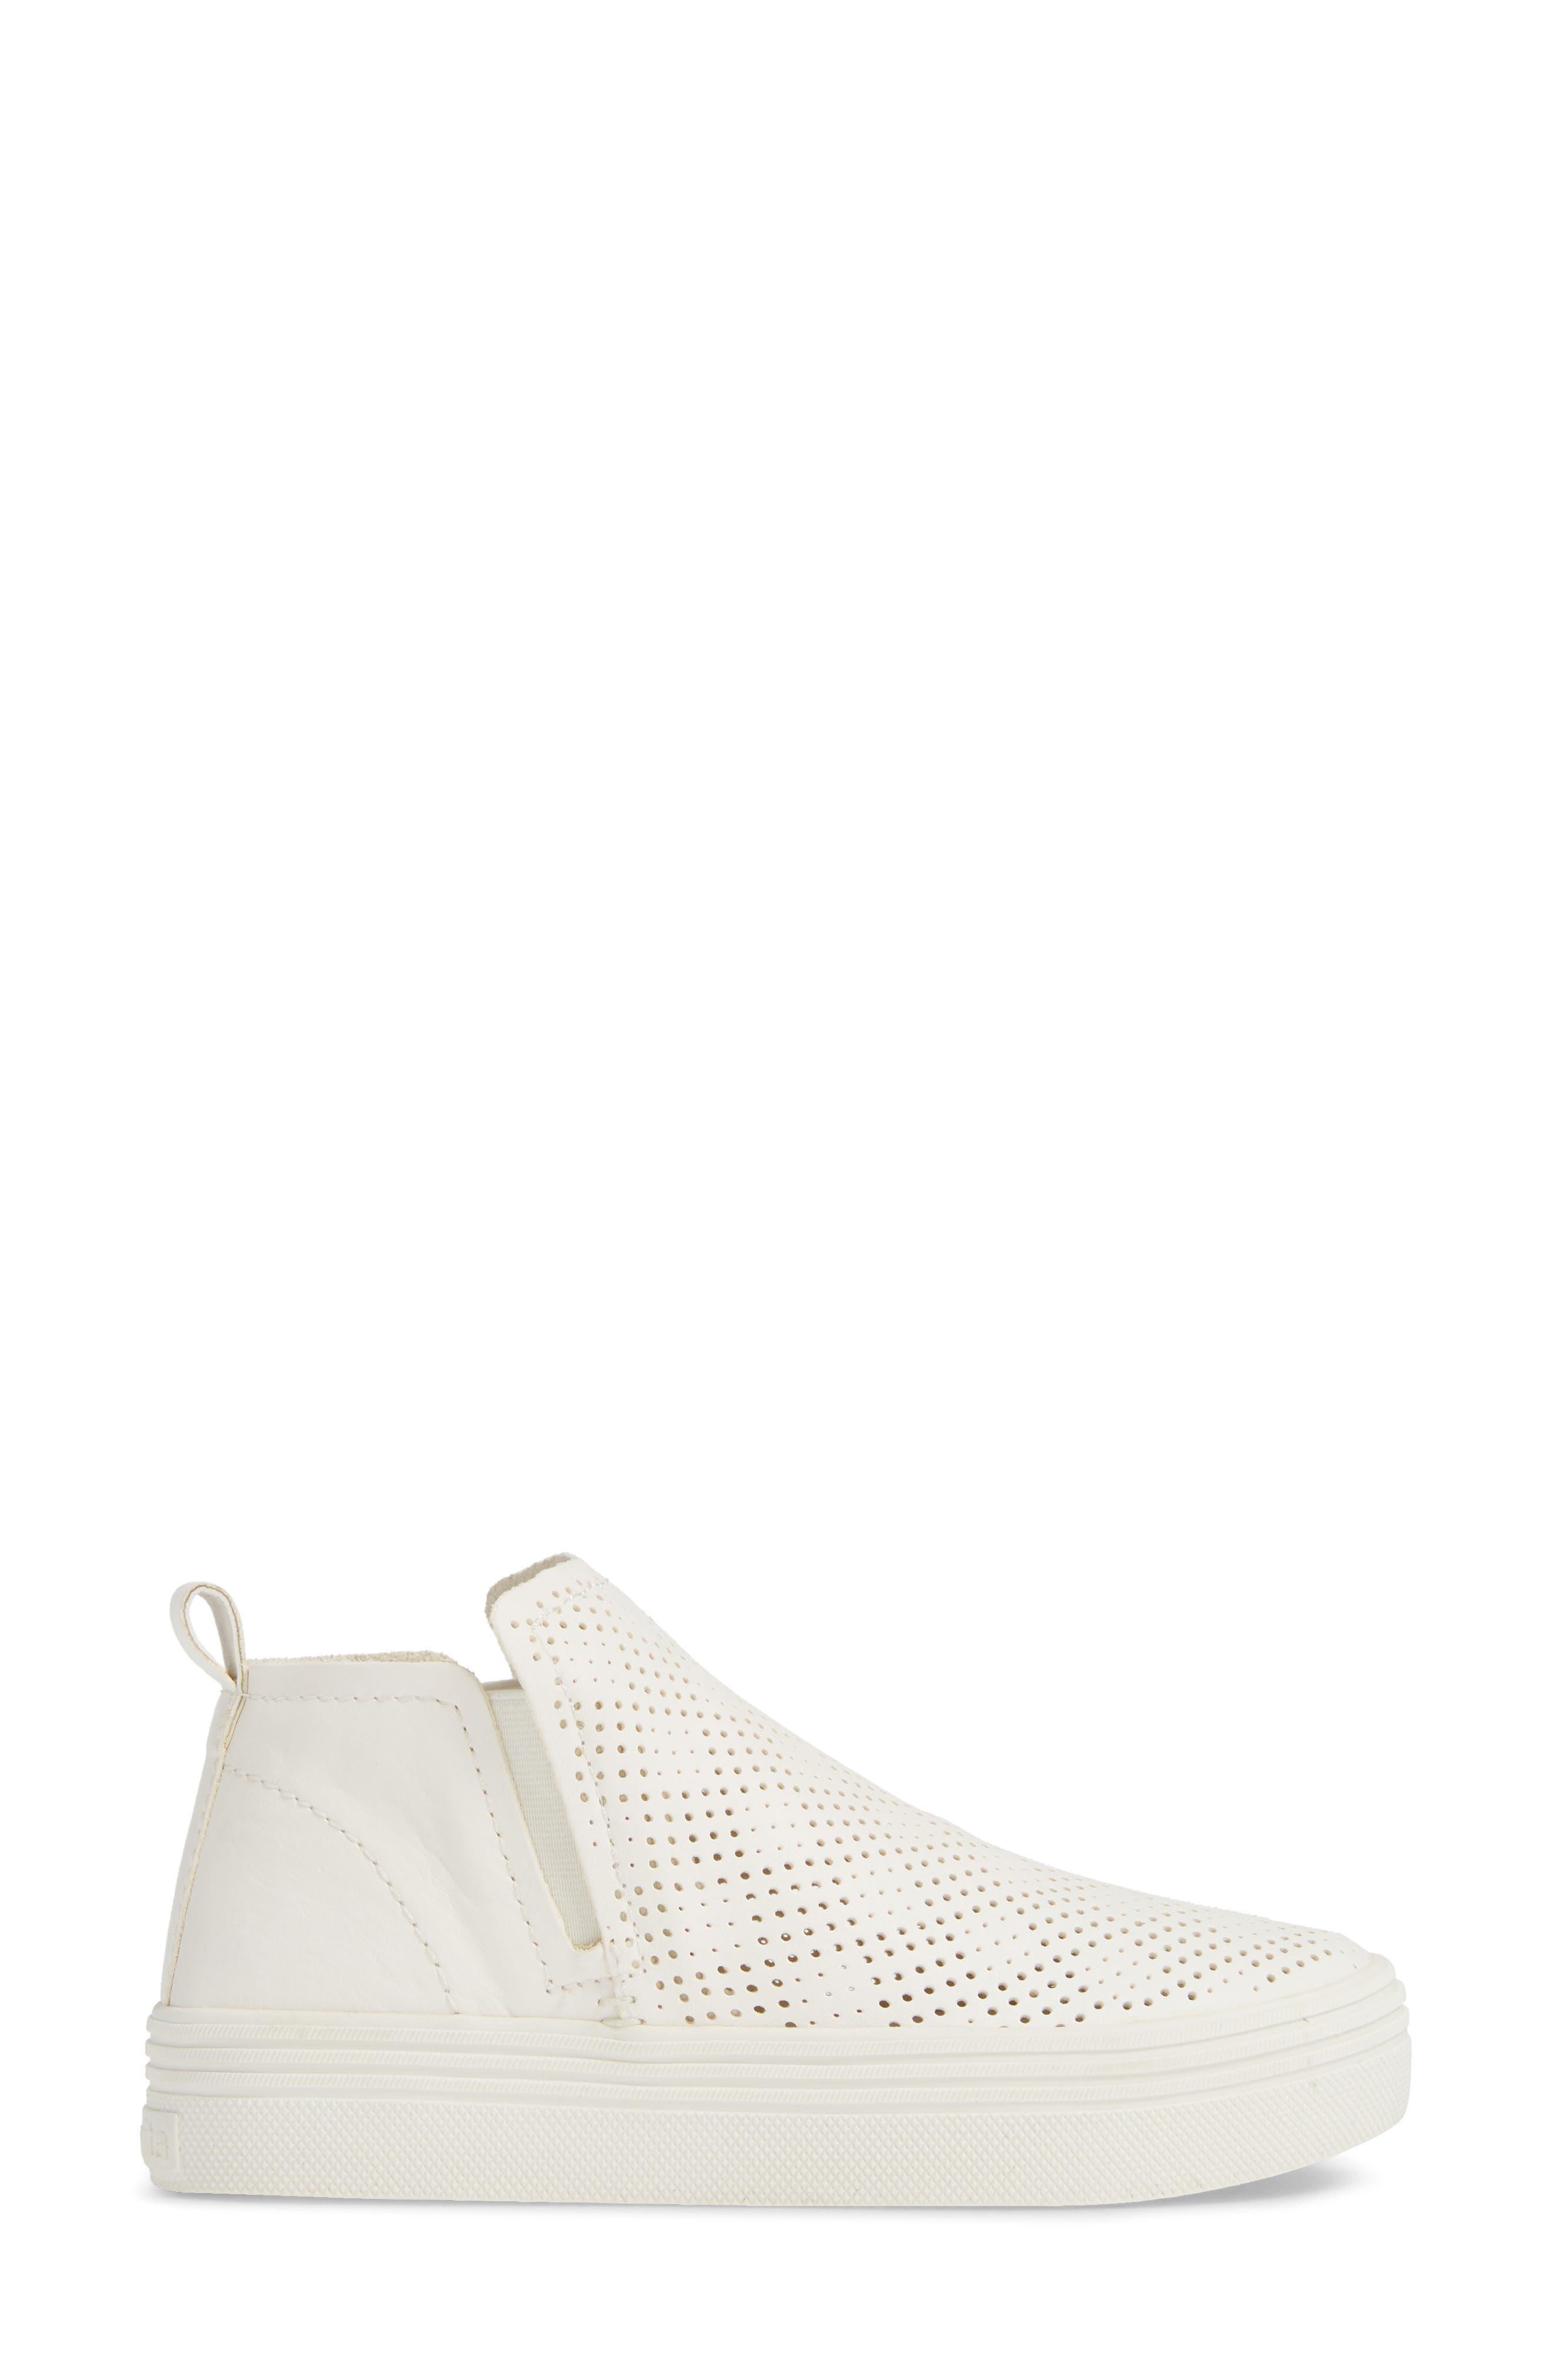 Tate Sneaker,                             Alternate thumbnail 3, color,                             WHITE